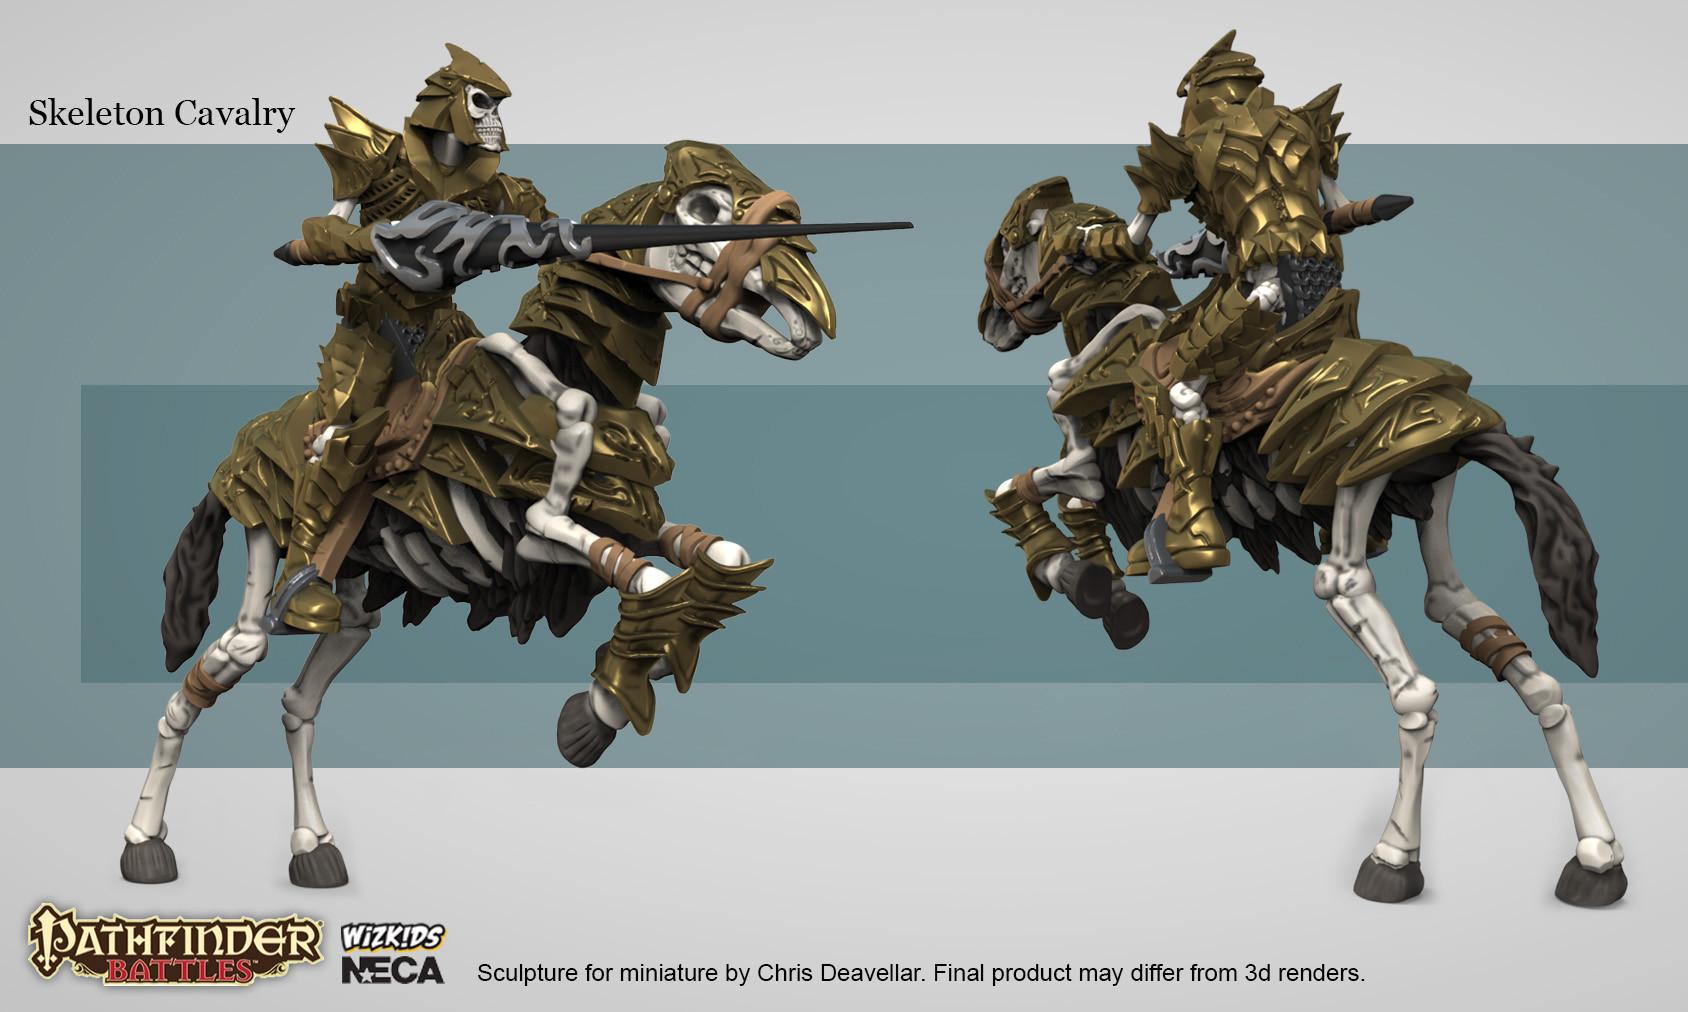 Chris deavellar neca pf skel cavalry website